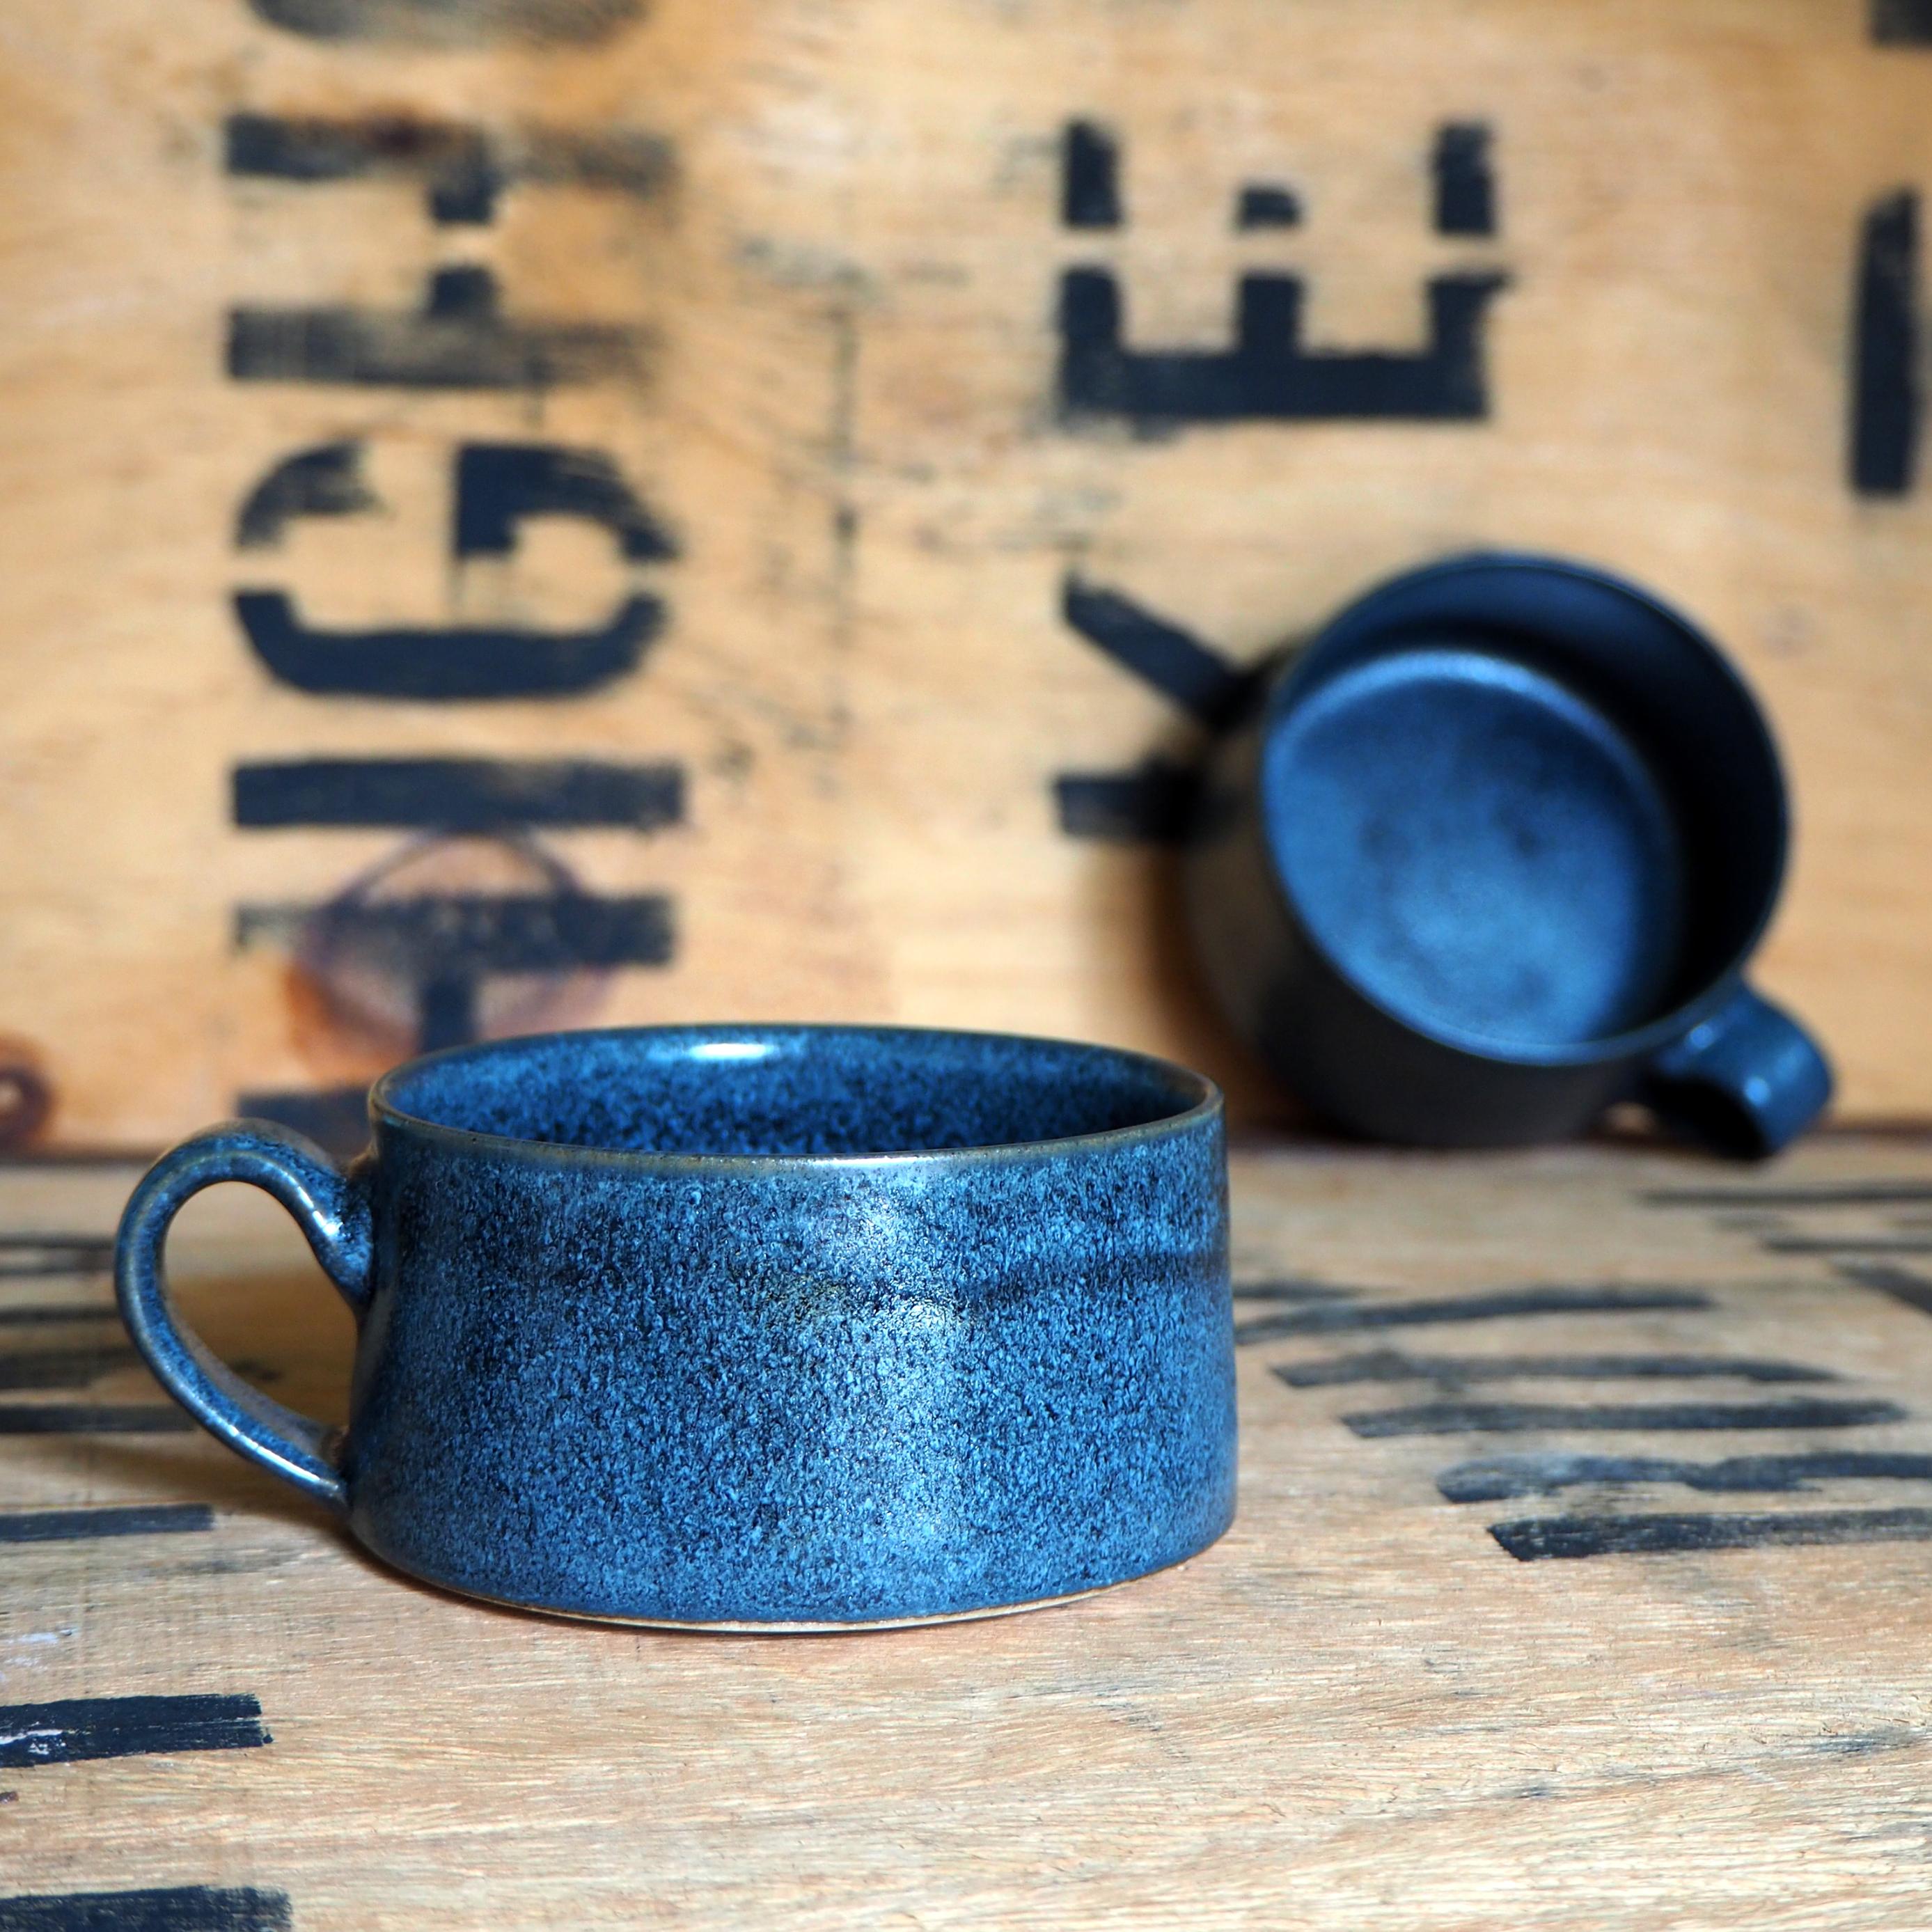 Slate Cup By Raphaela Seck